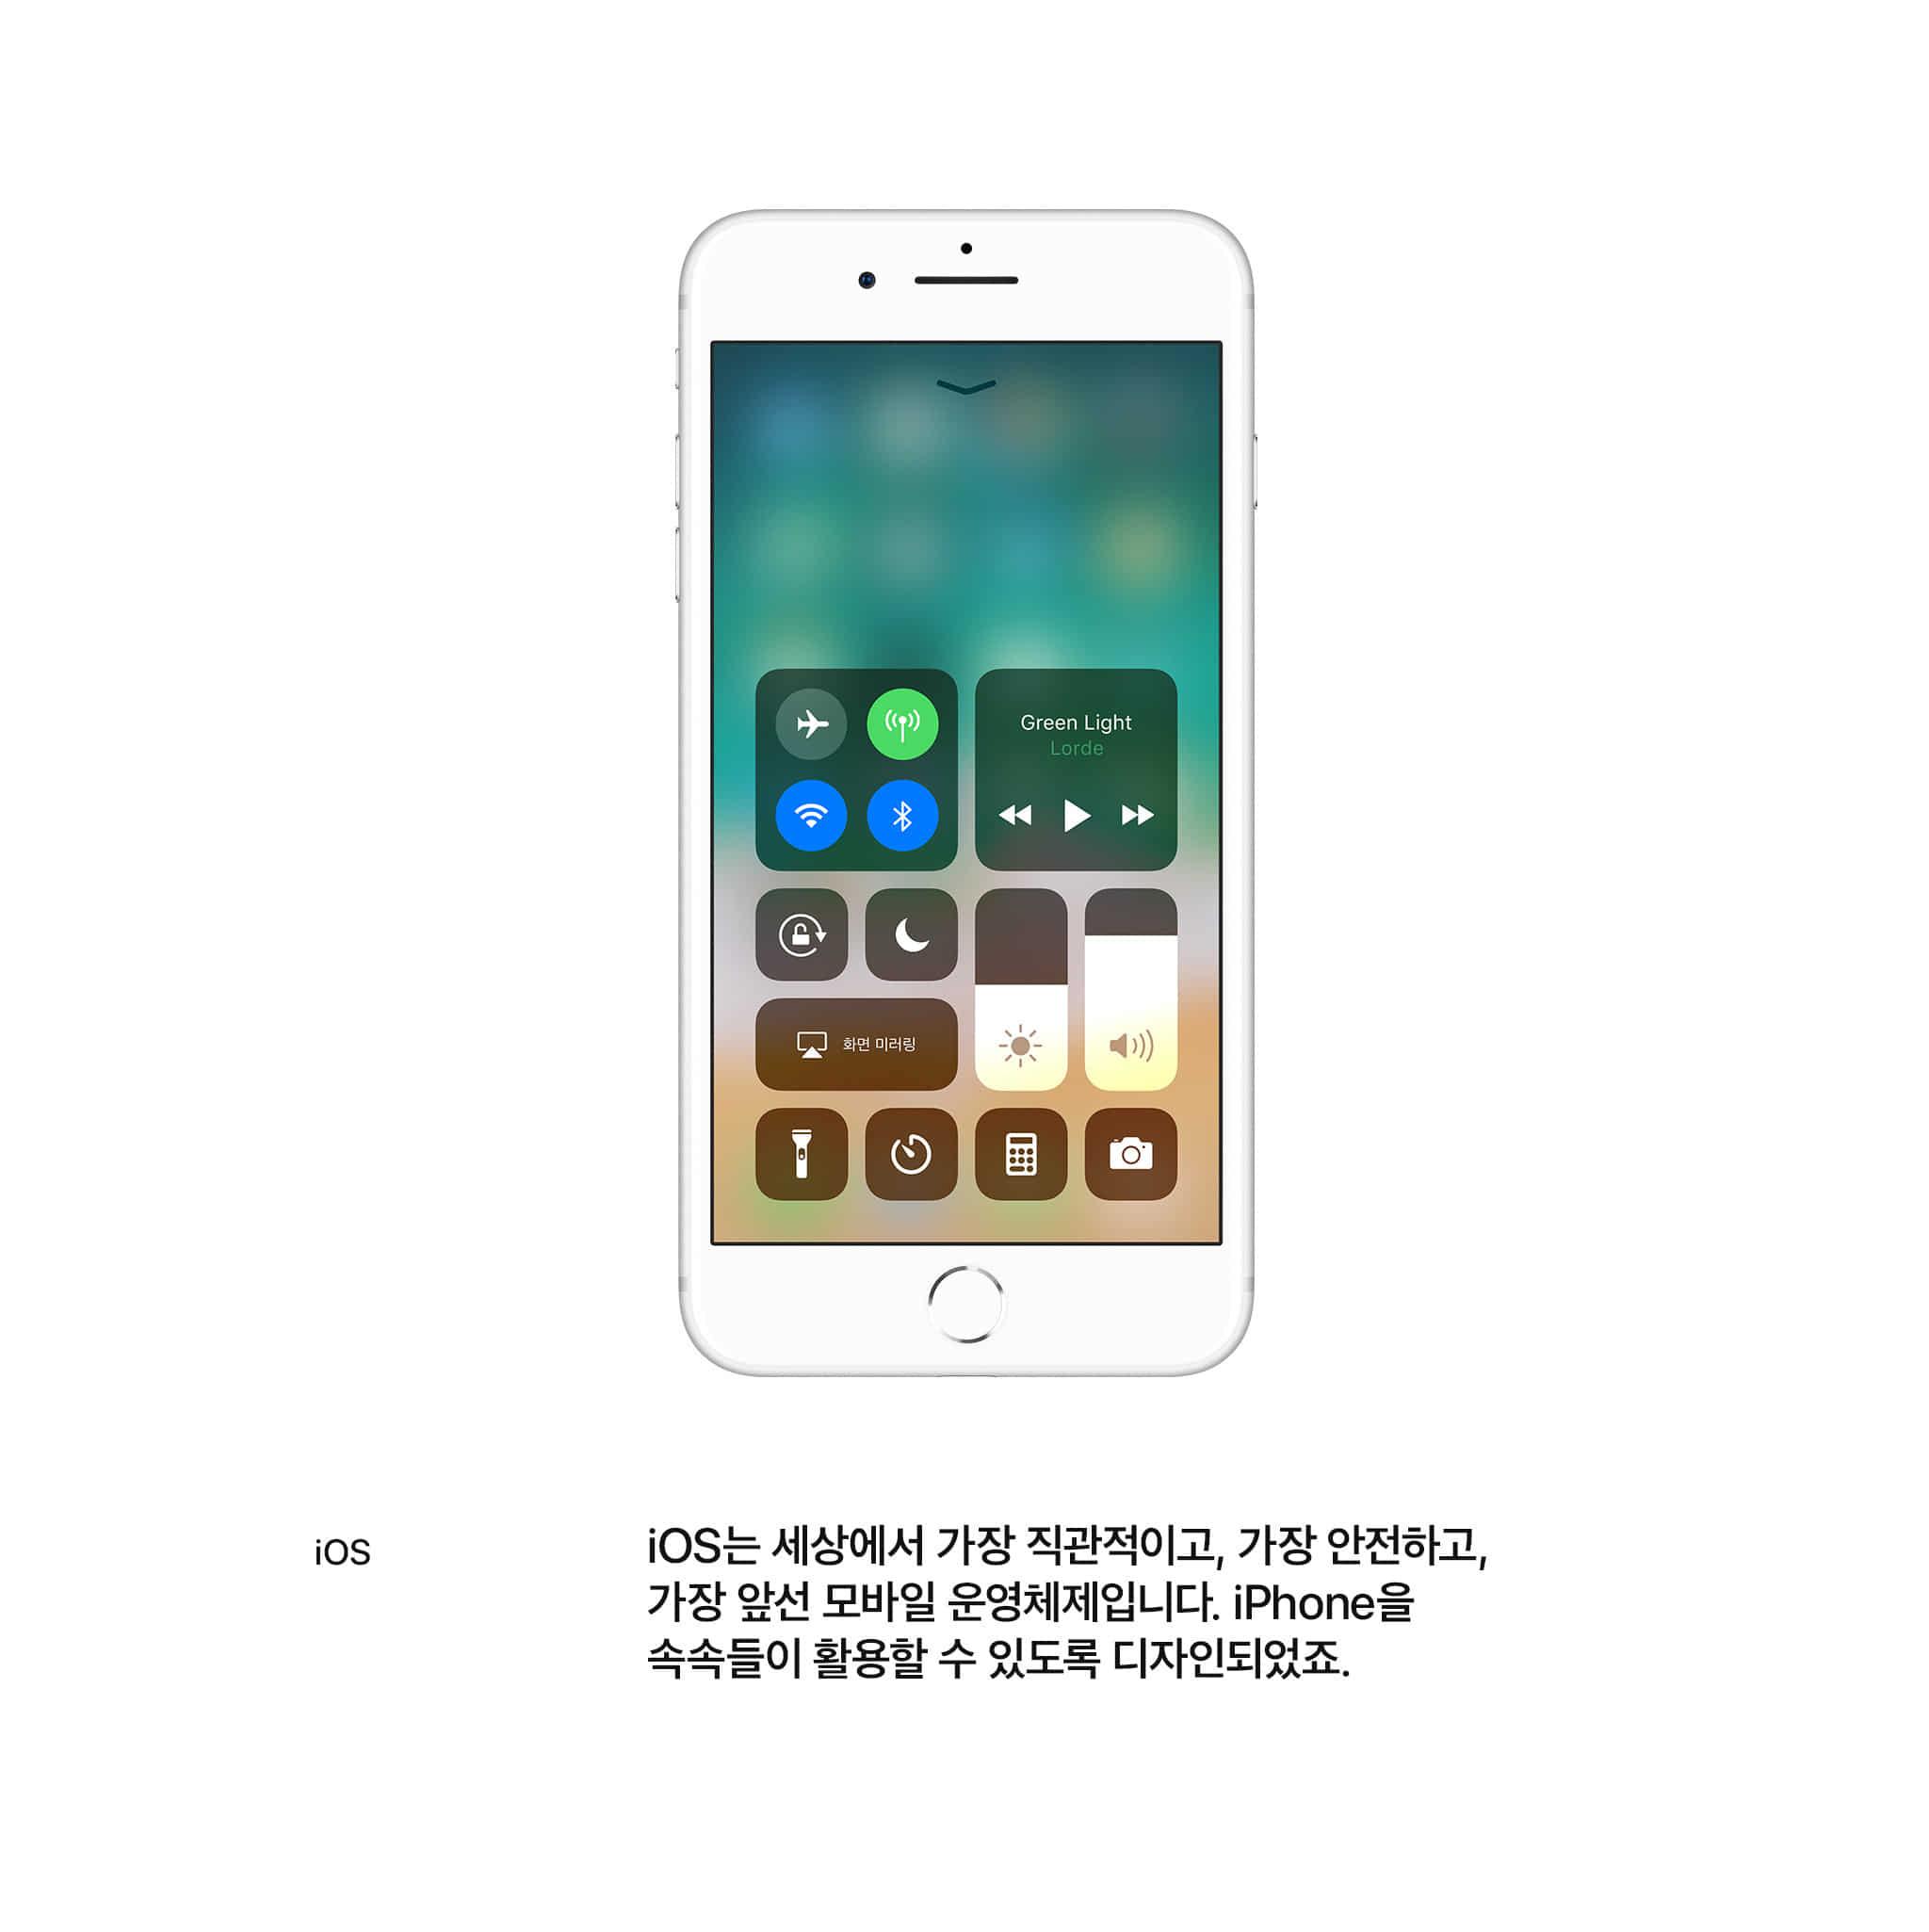 ios ios는 세상에서 가장 직관적이고, 가장 안전하고, 가장앞선 모바일 운영체제입니다. iPhone을 속속들이 활용할 수 있도록 디자인되었죠.